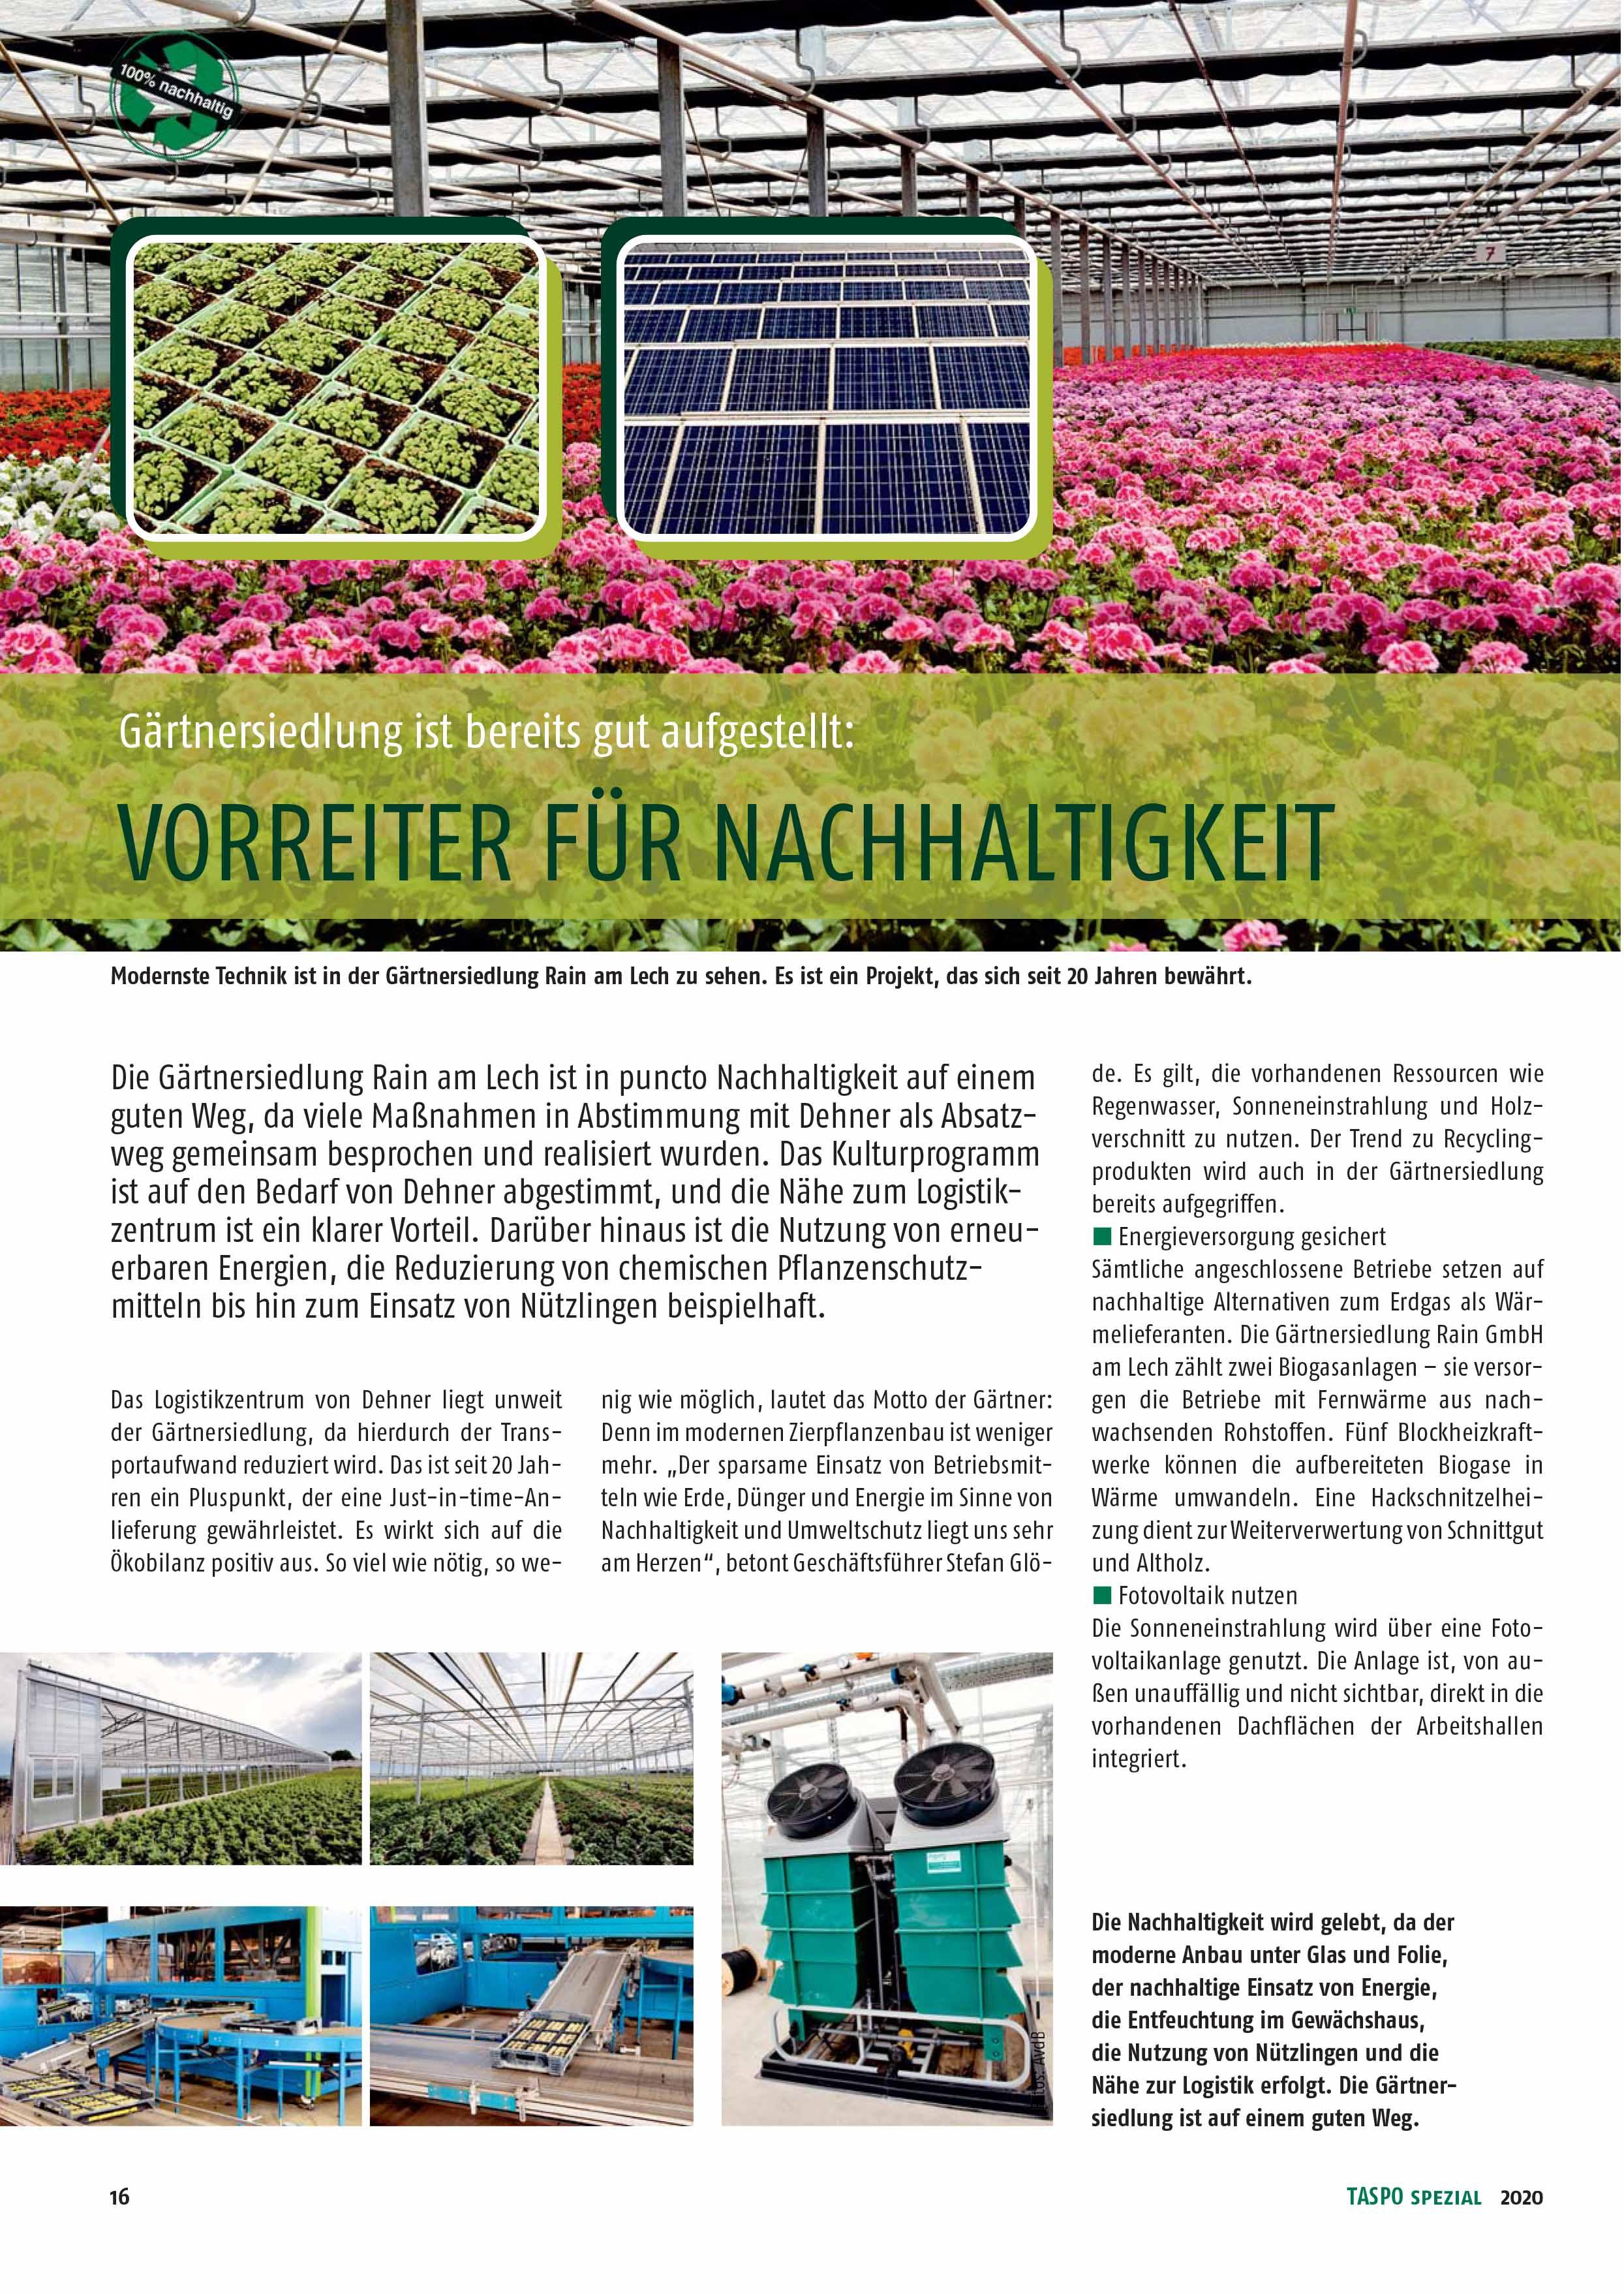 TASPO Spezial Nachhaltigkeit 03.04.2020